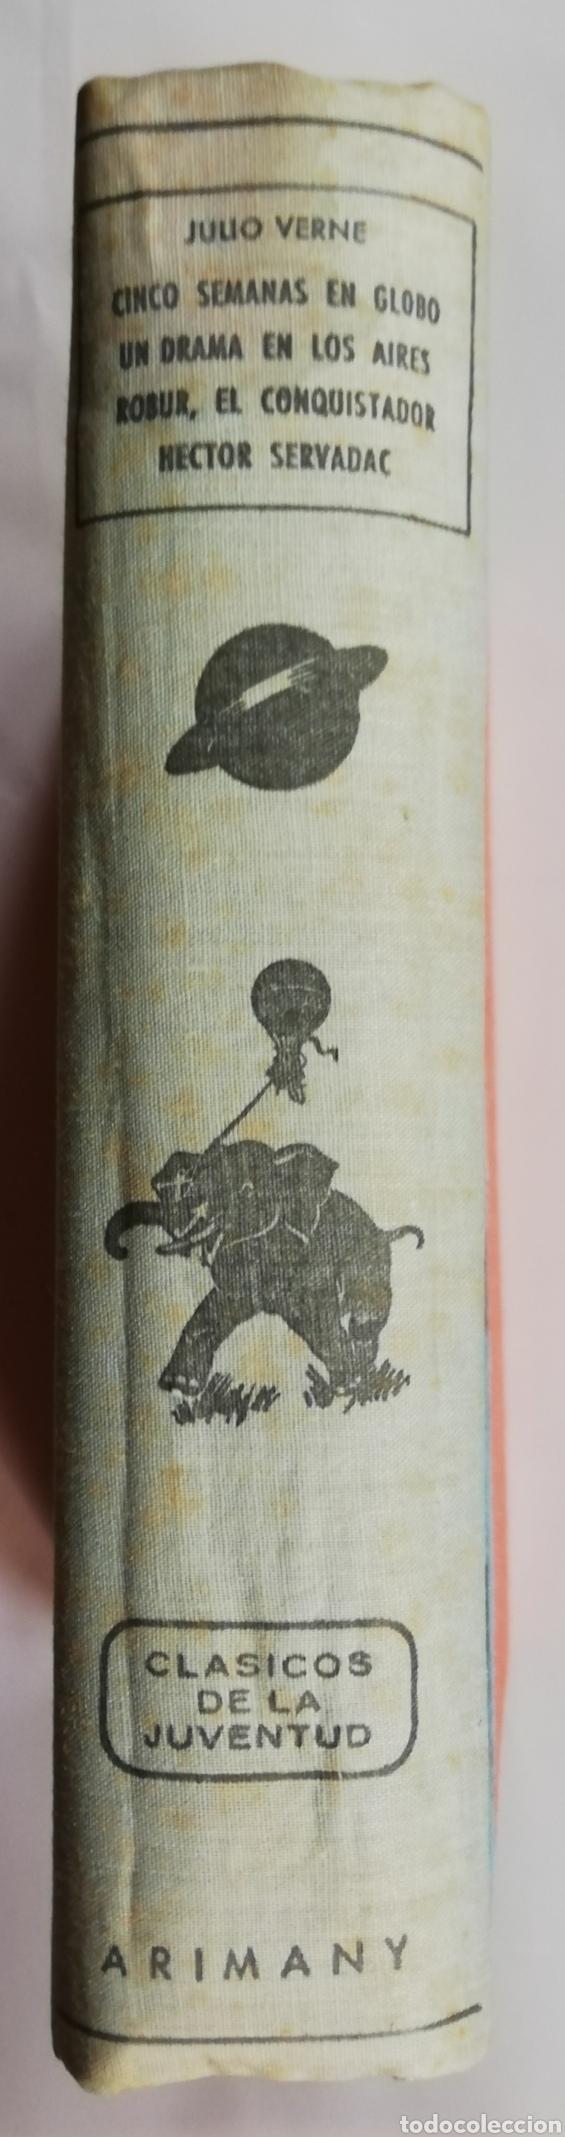 4 NOVELAS DE JULIO VERNE (**) -1958 - ED. M.ARIMANY - PJRB (Libros de Segunda Mano (posteriores a 1936) - Literatura - Narrativa - Clásicos)